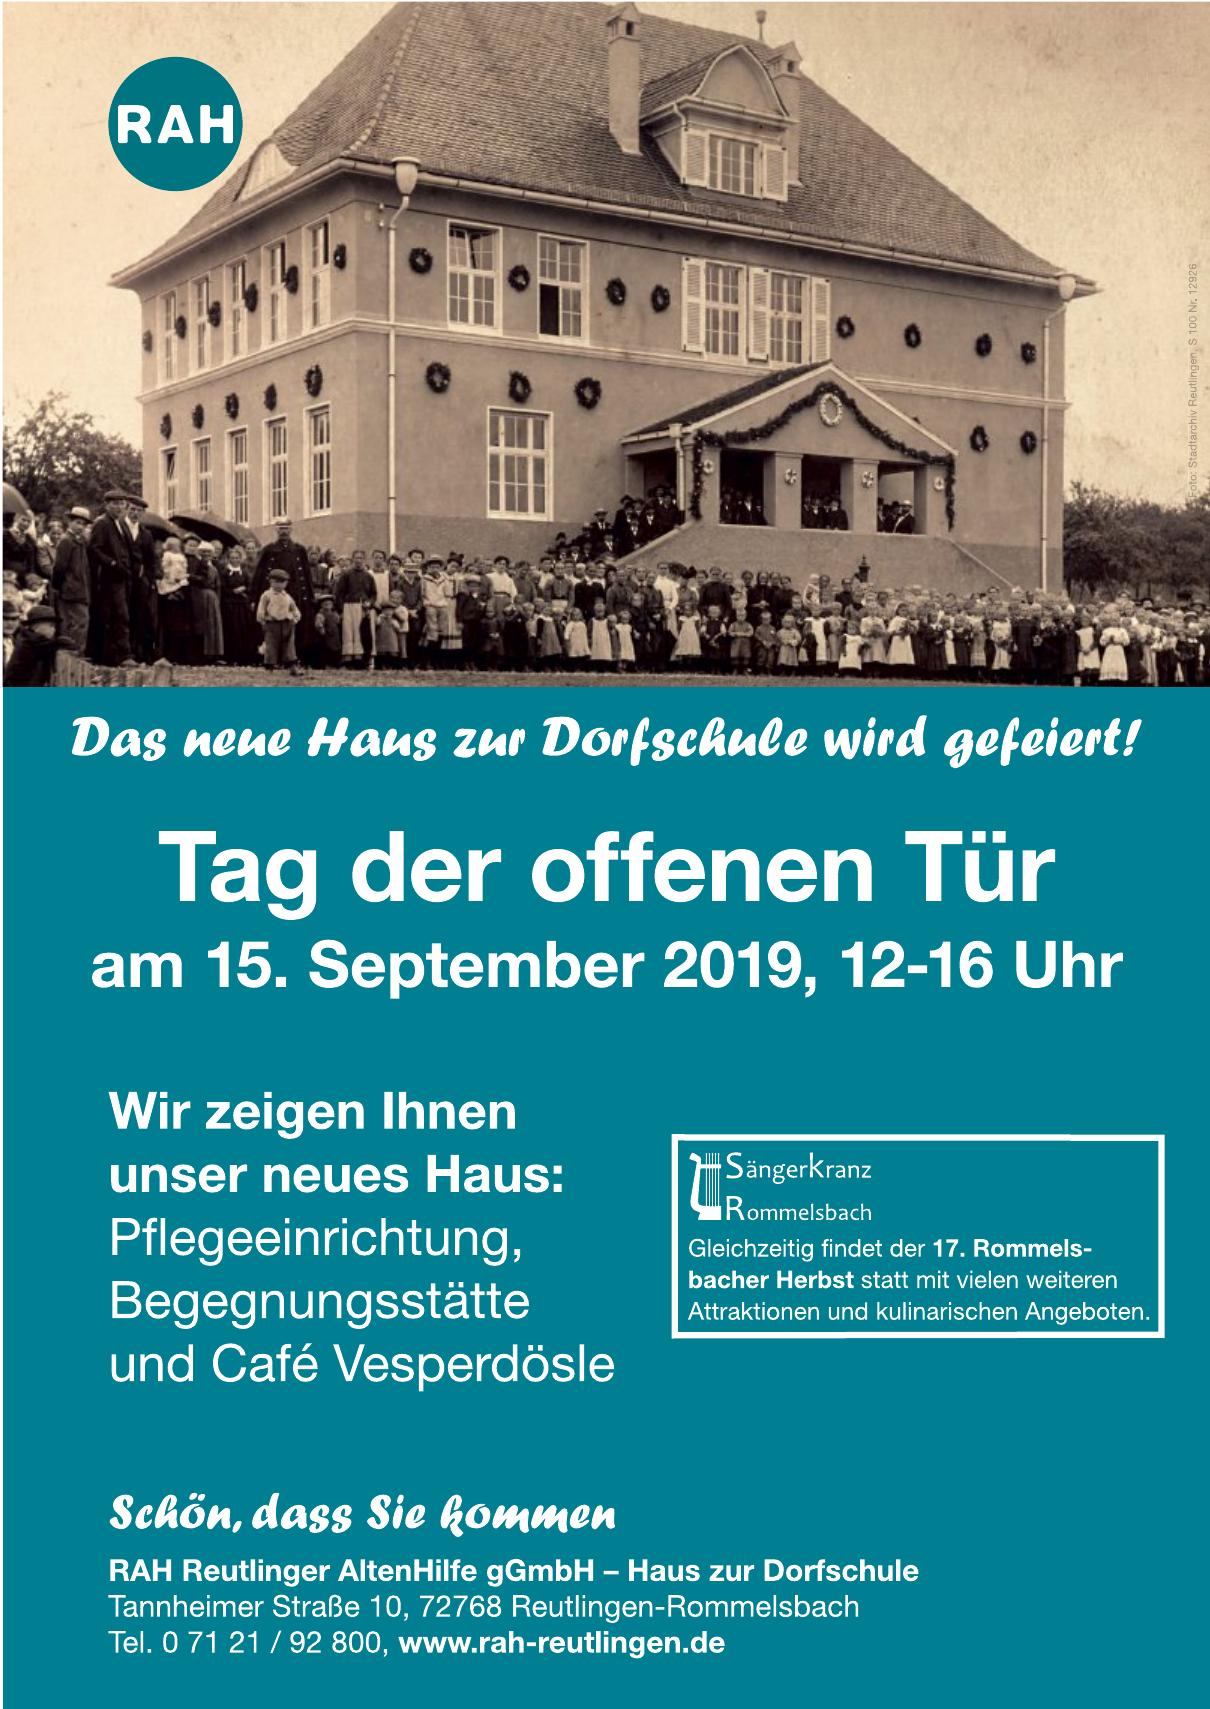 RAH Reutlinger AltenHilfe gGmbH – Haus zur Dorfschule